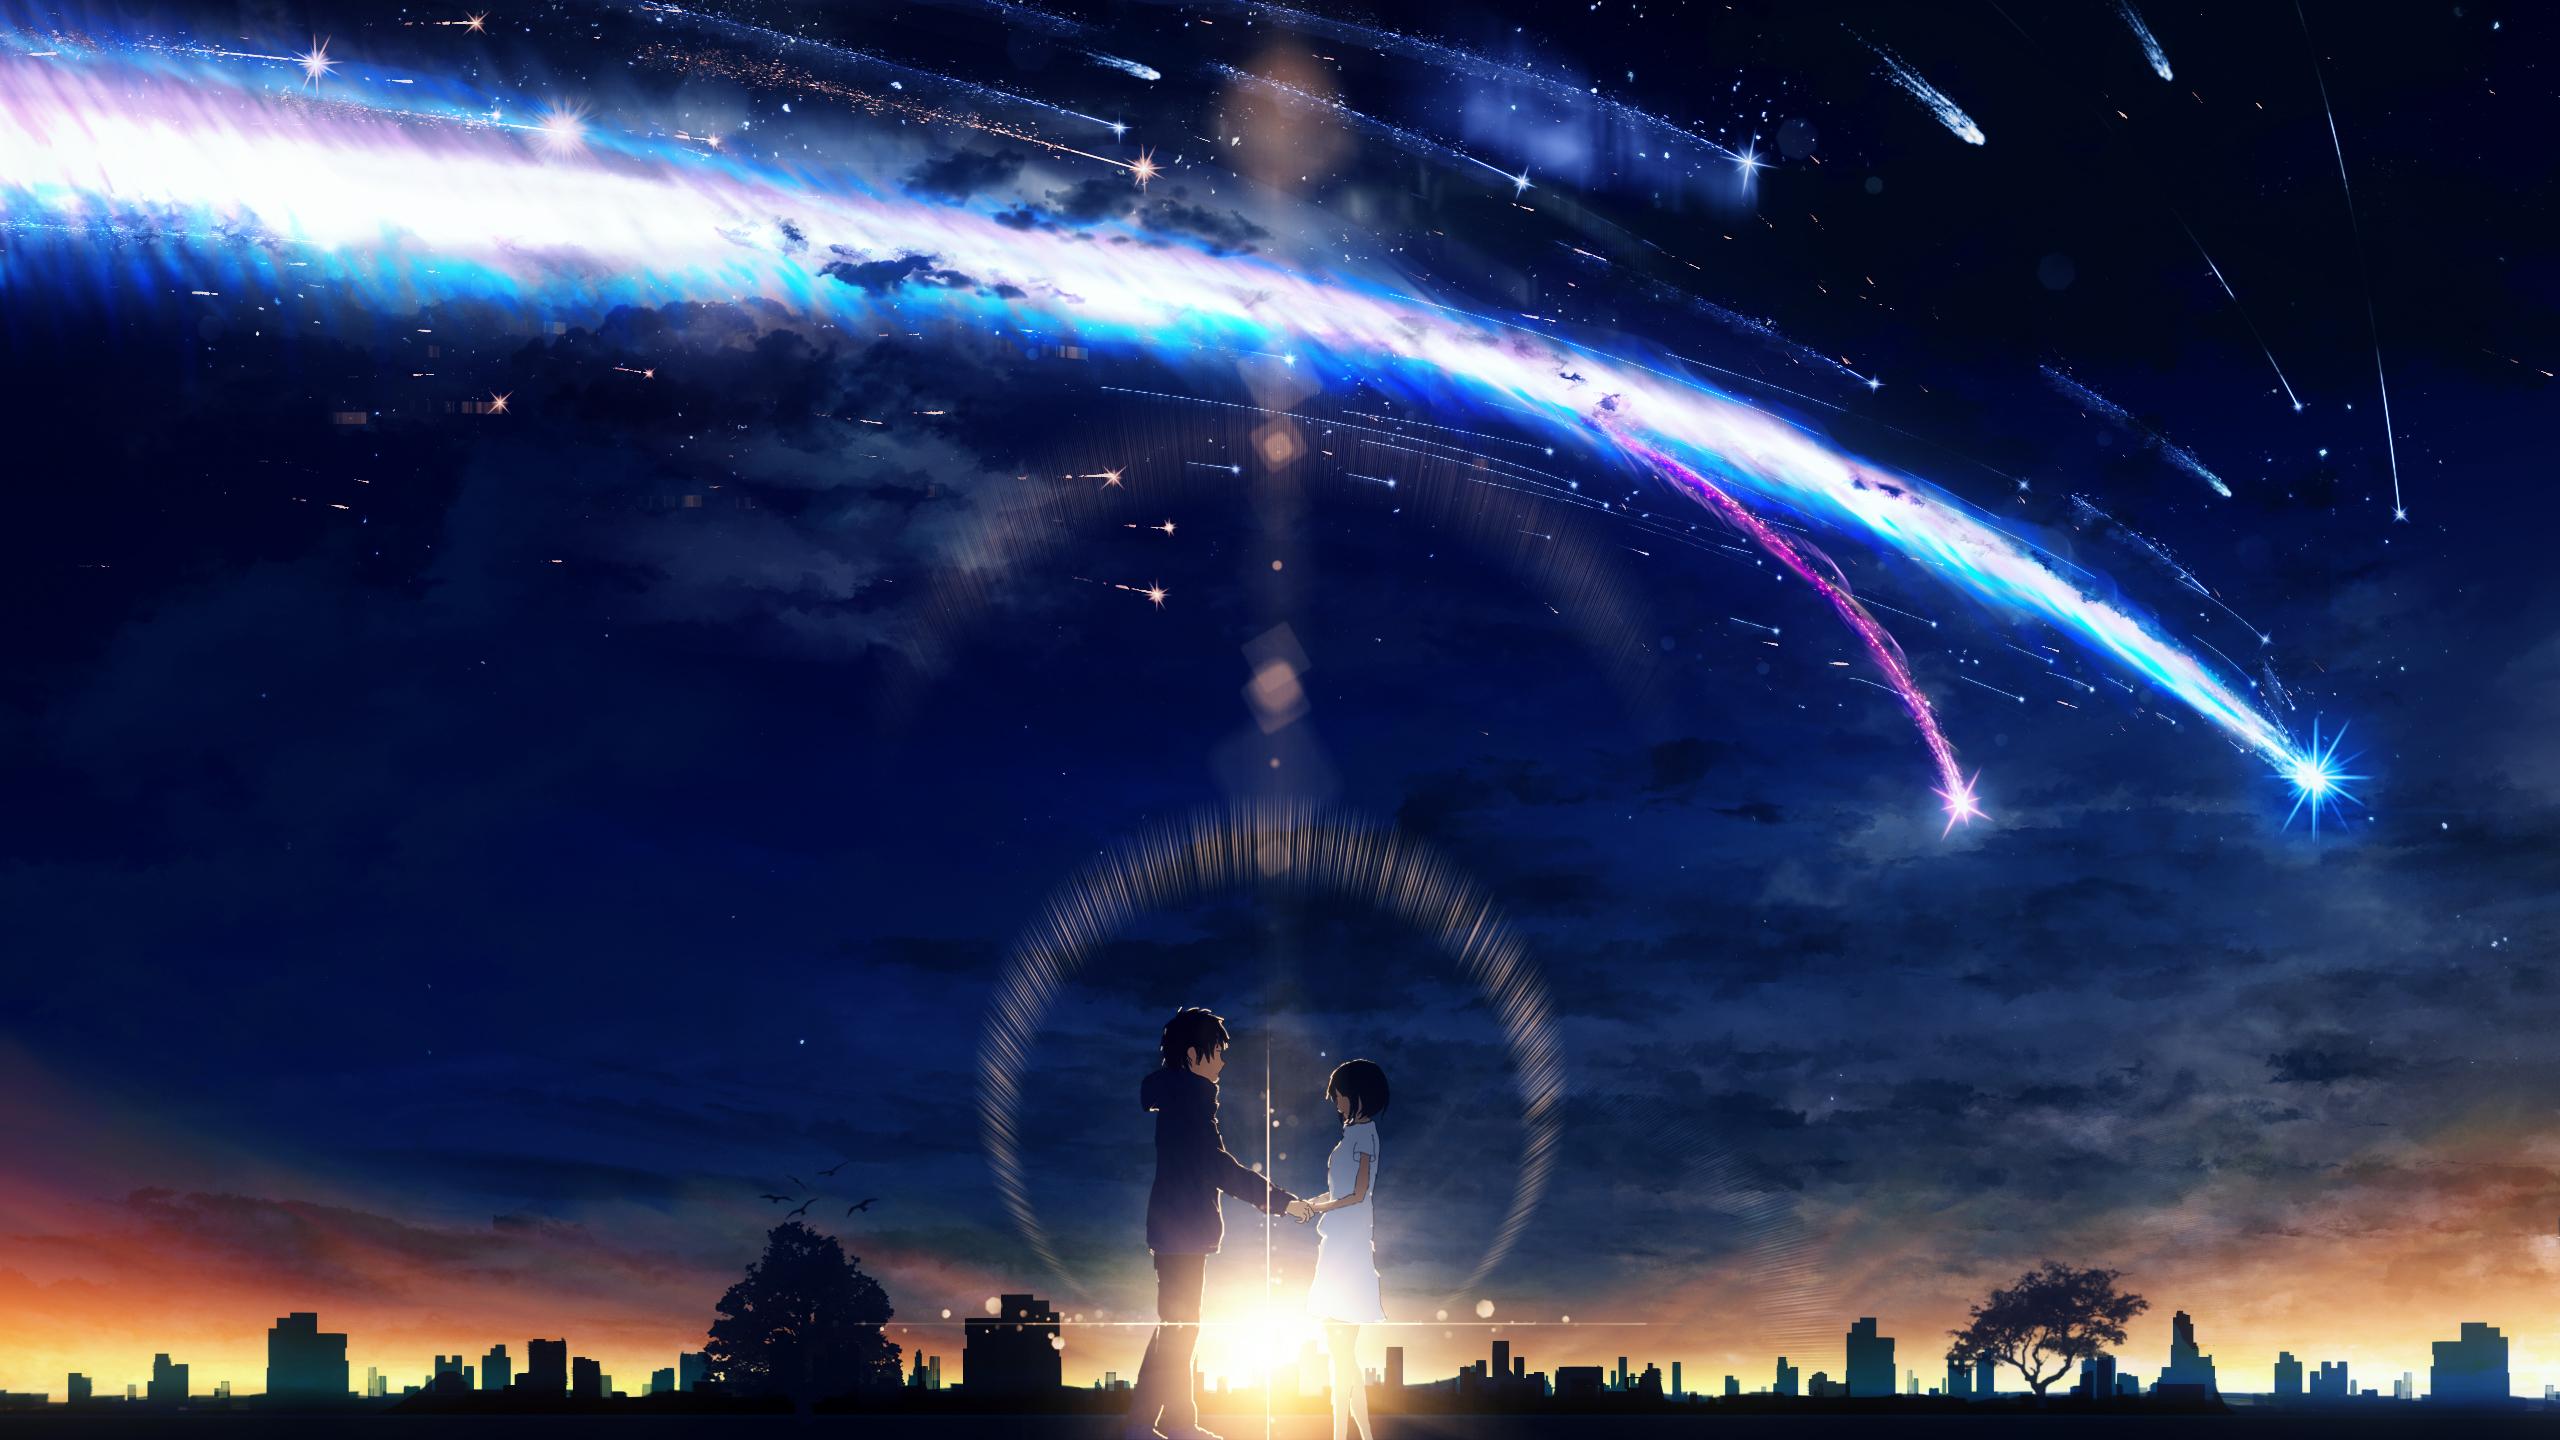 your name wallpaper  Kimi no Na wa. (Your Name.) Wallpaper #2237875 - Zerochan Anime ...